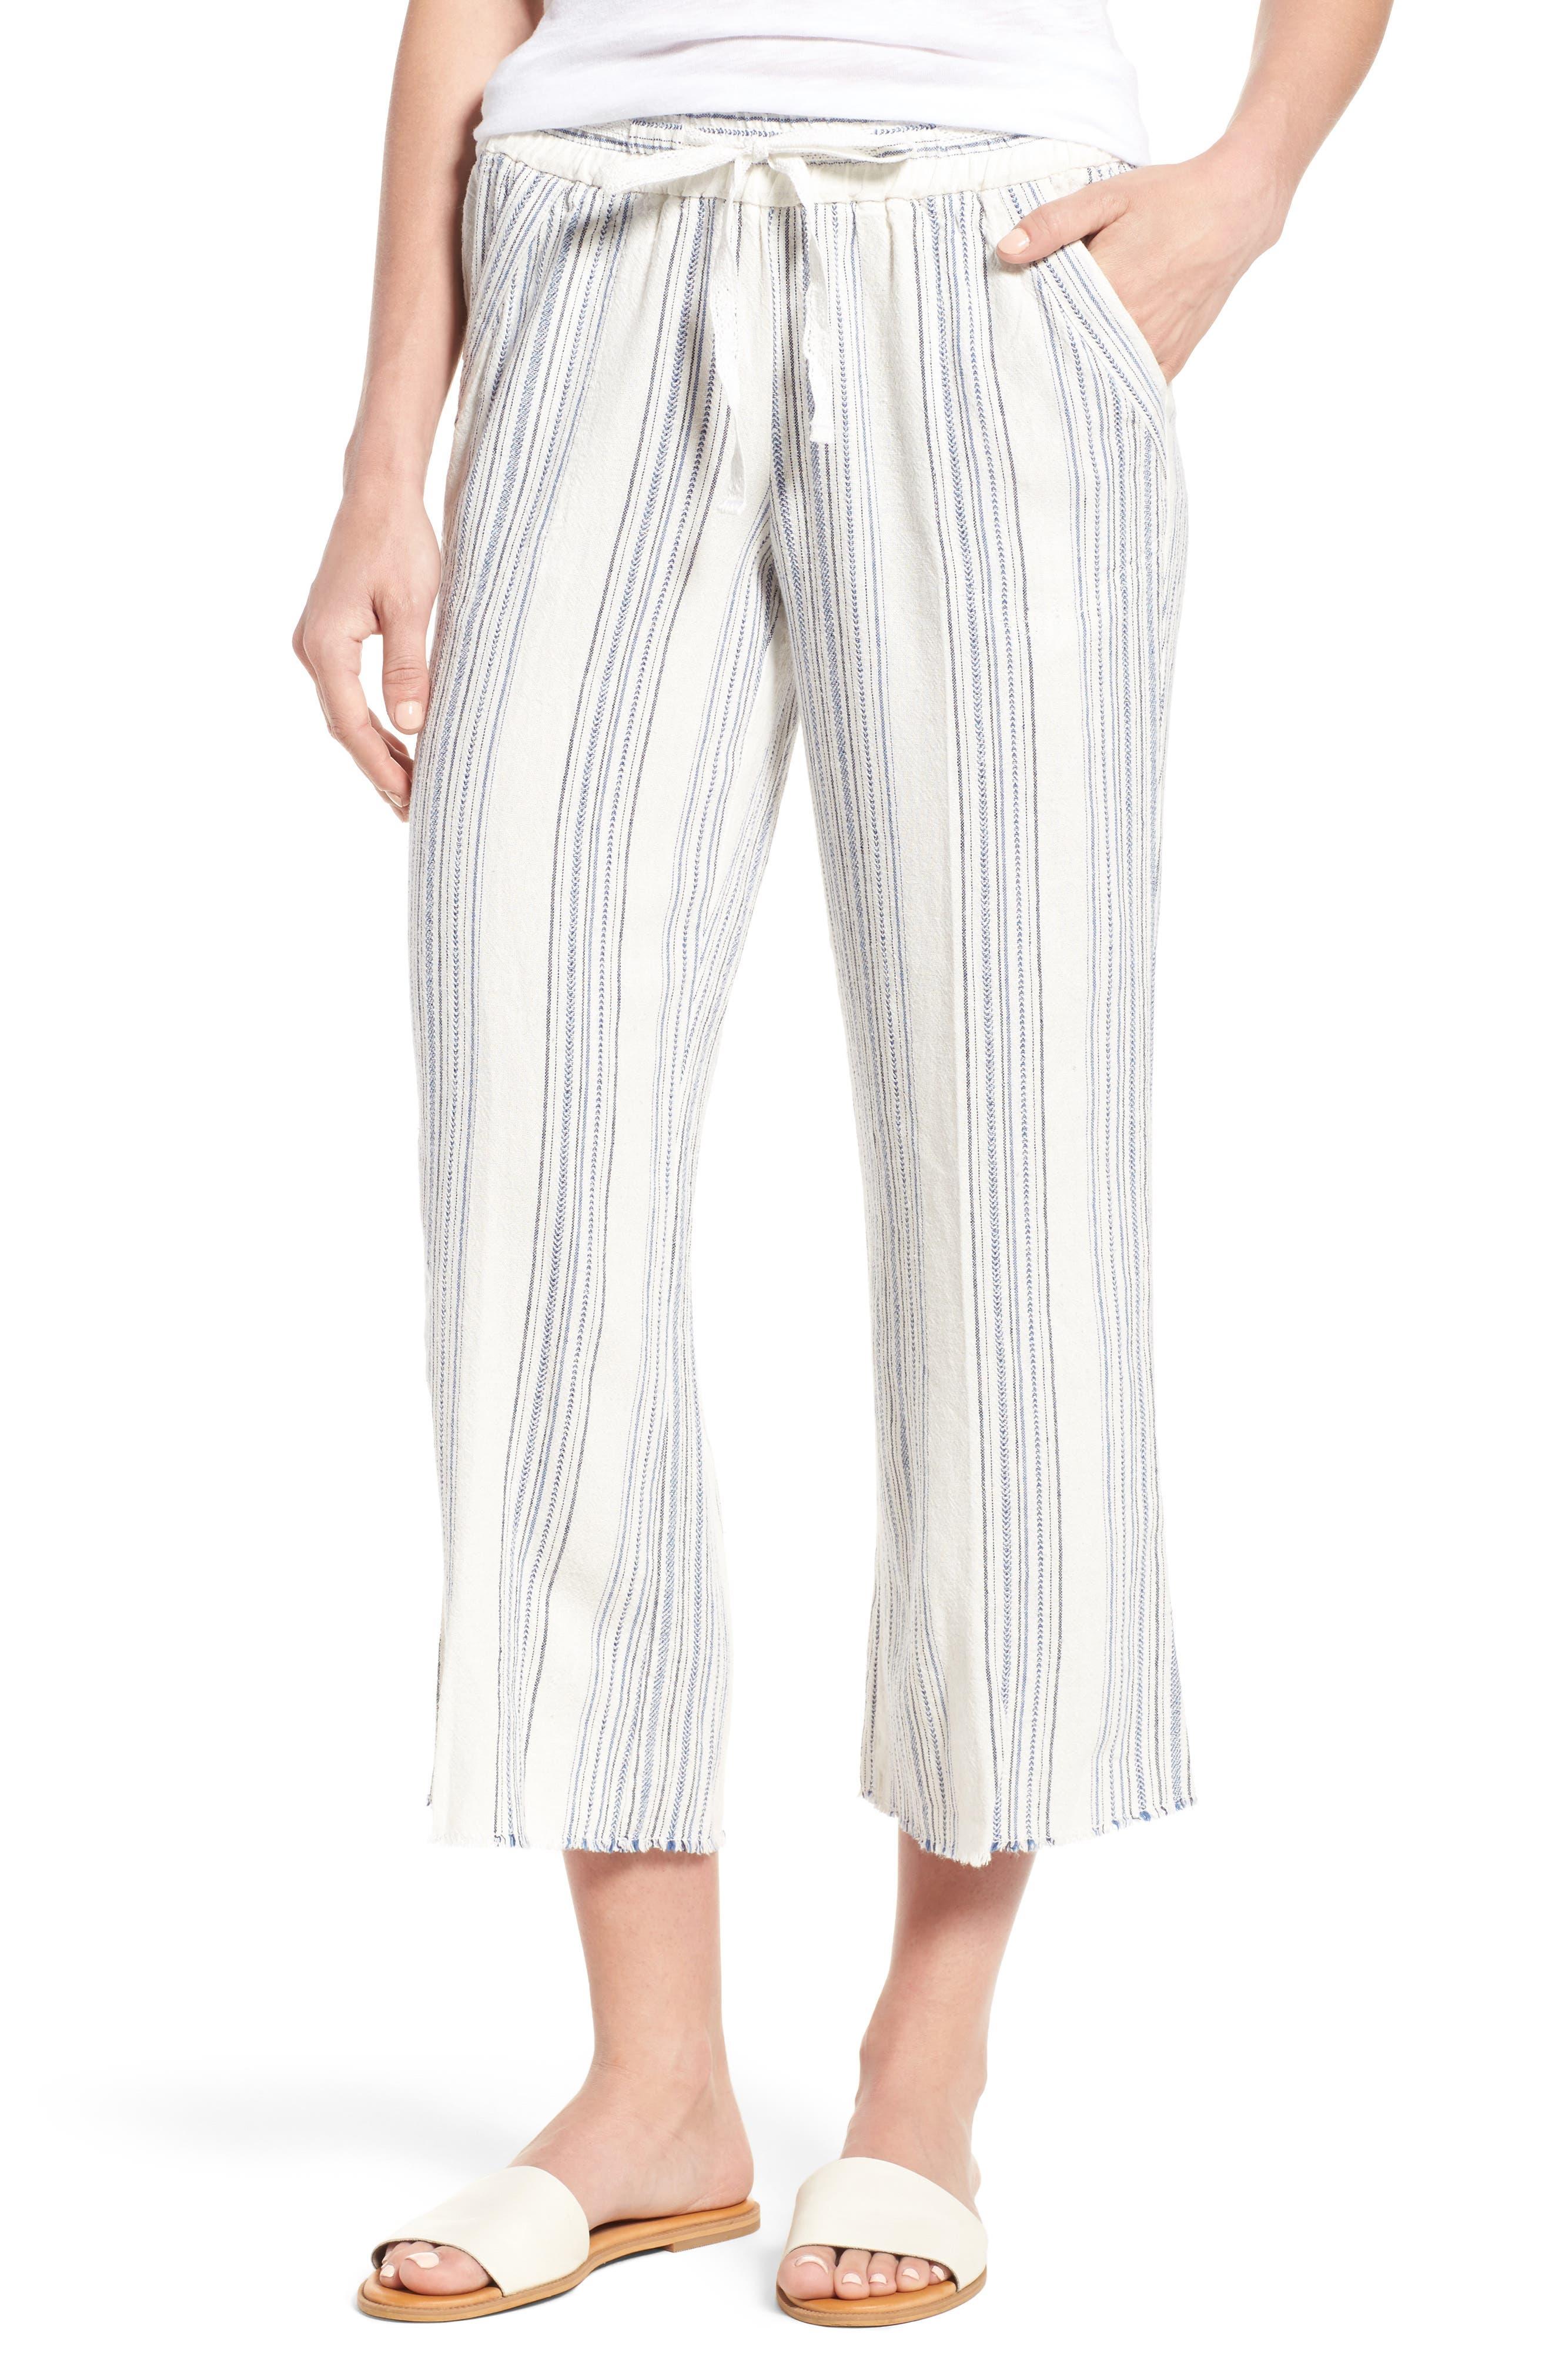 Wit & Wisdom Drawstring Stripe Crop Sailor Pants (Regular & Petite) (Nordstrom Exclusive)